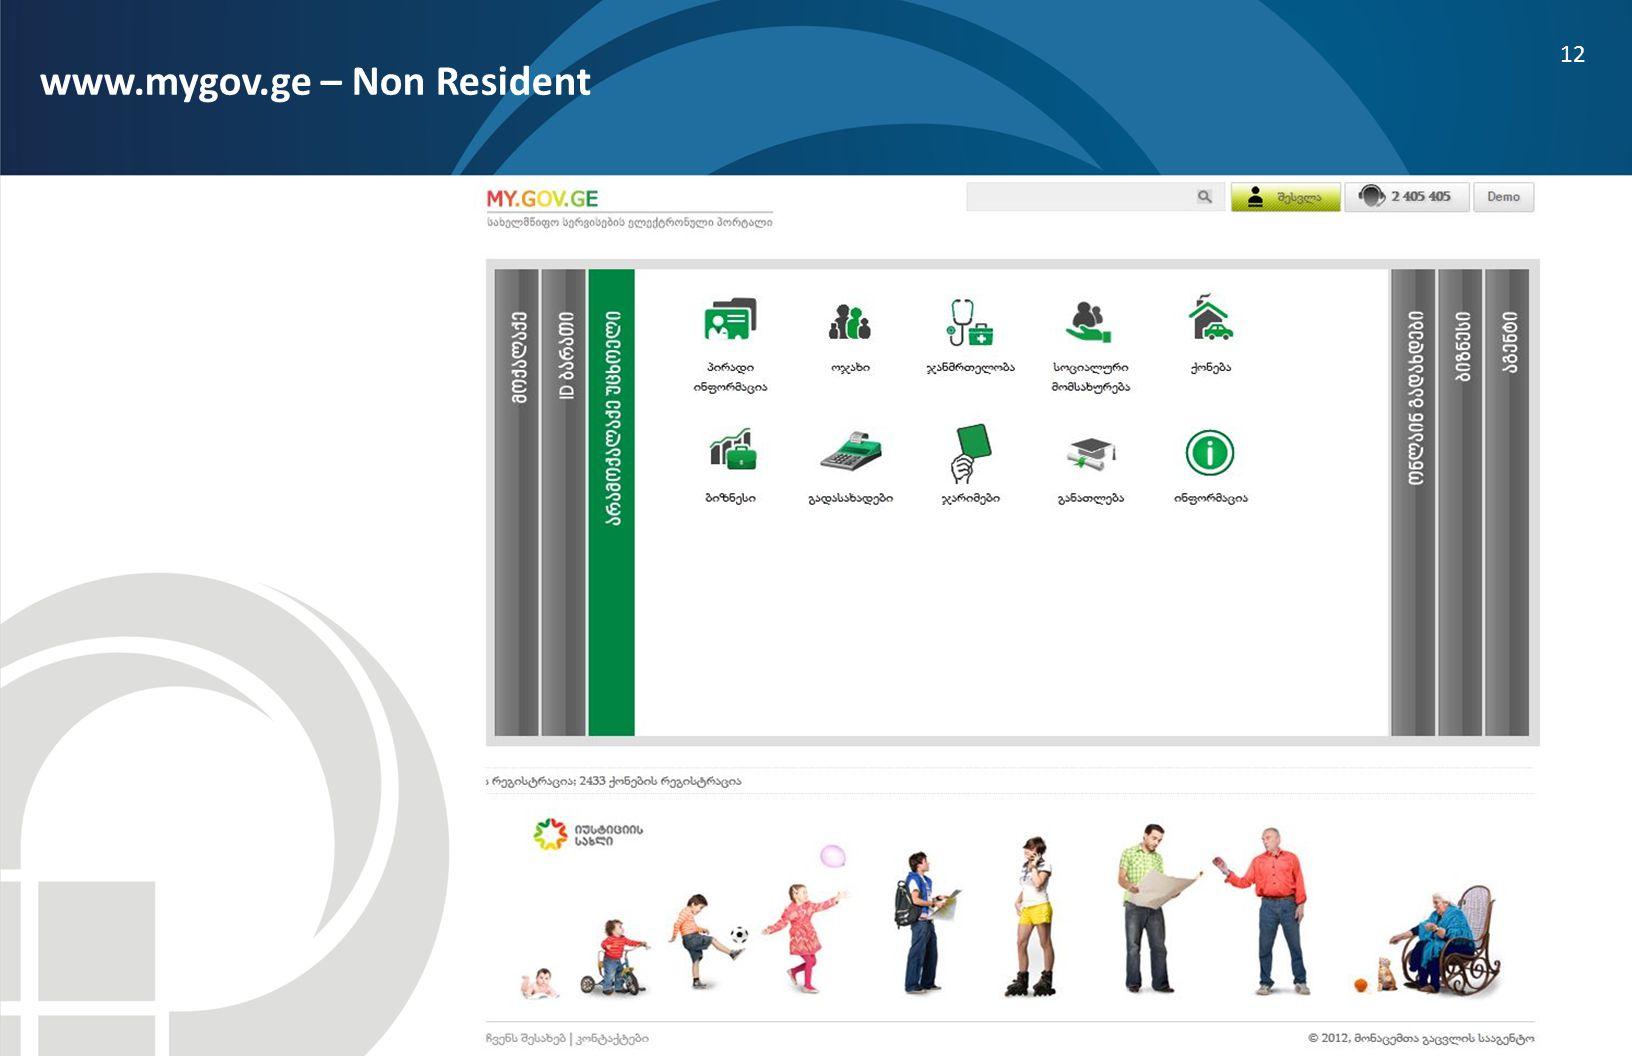 www.mygov.ge – Non Resident